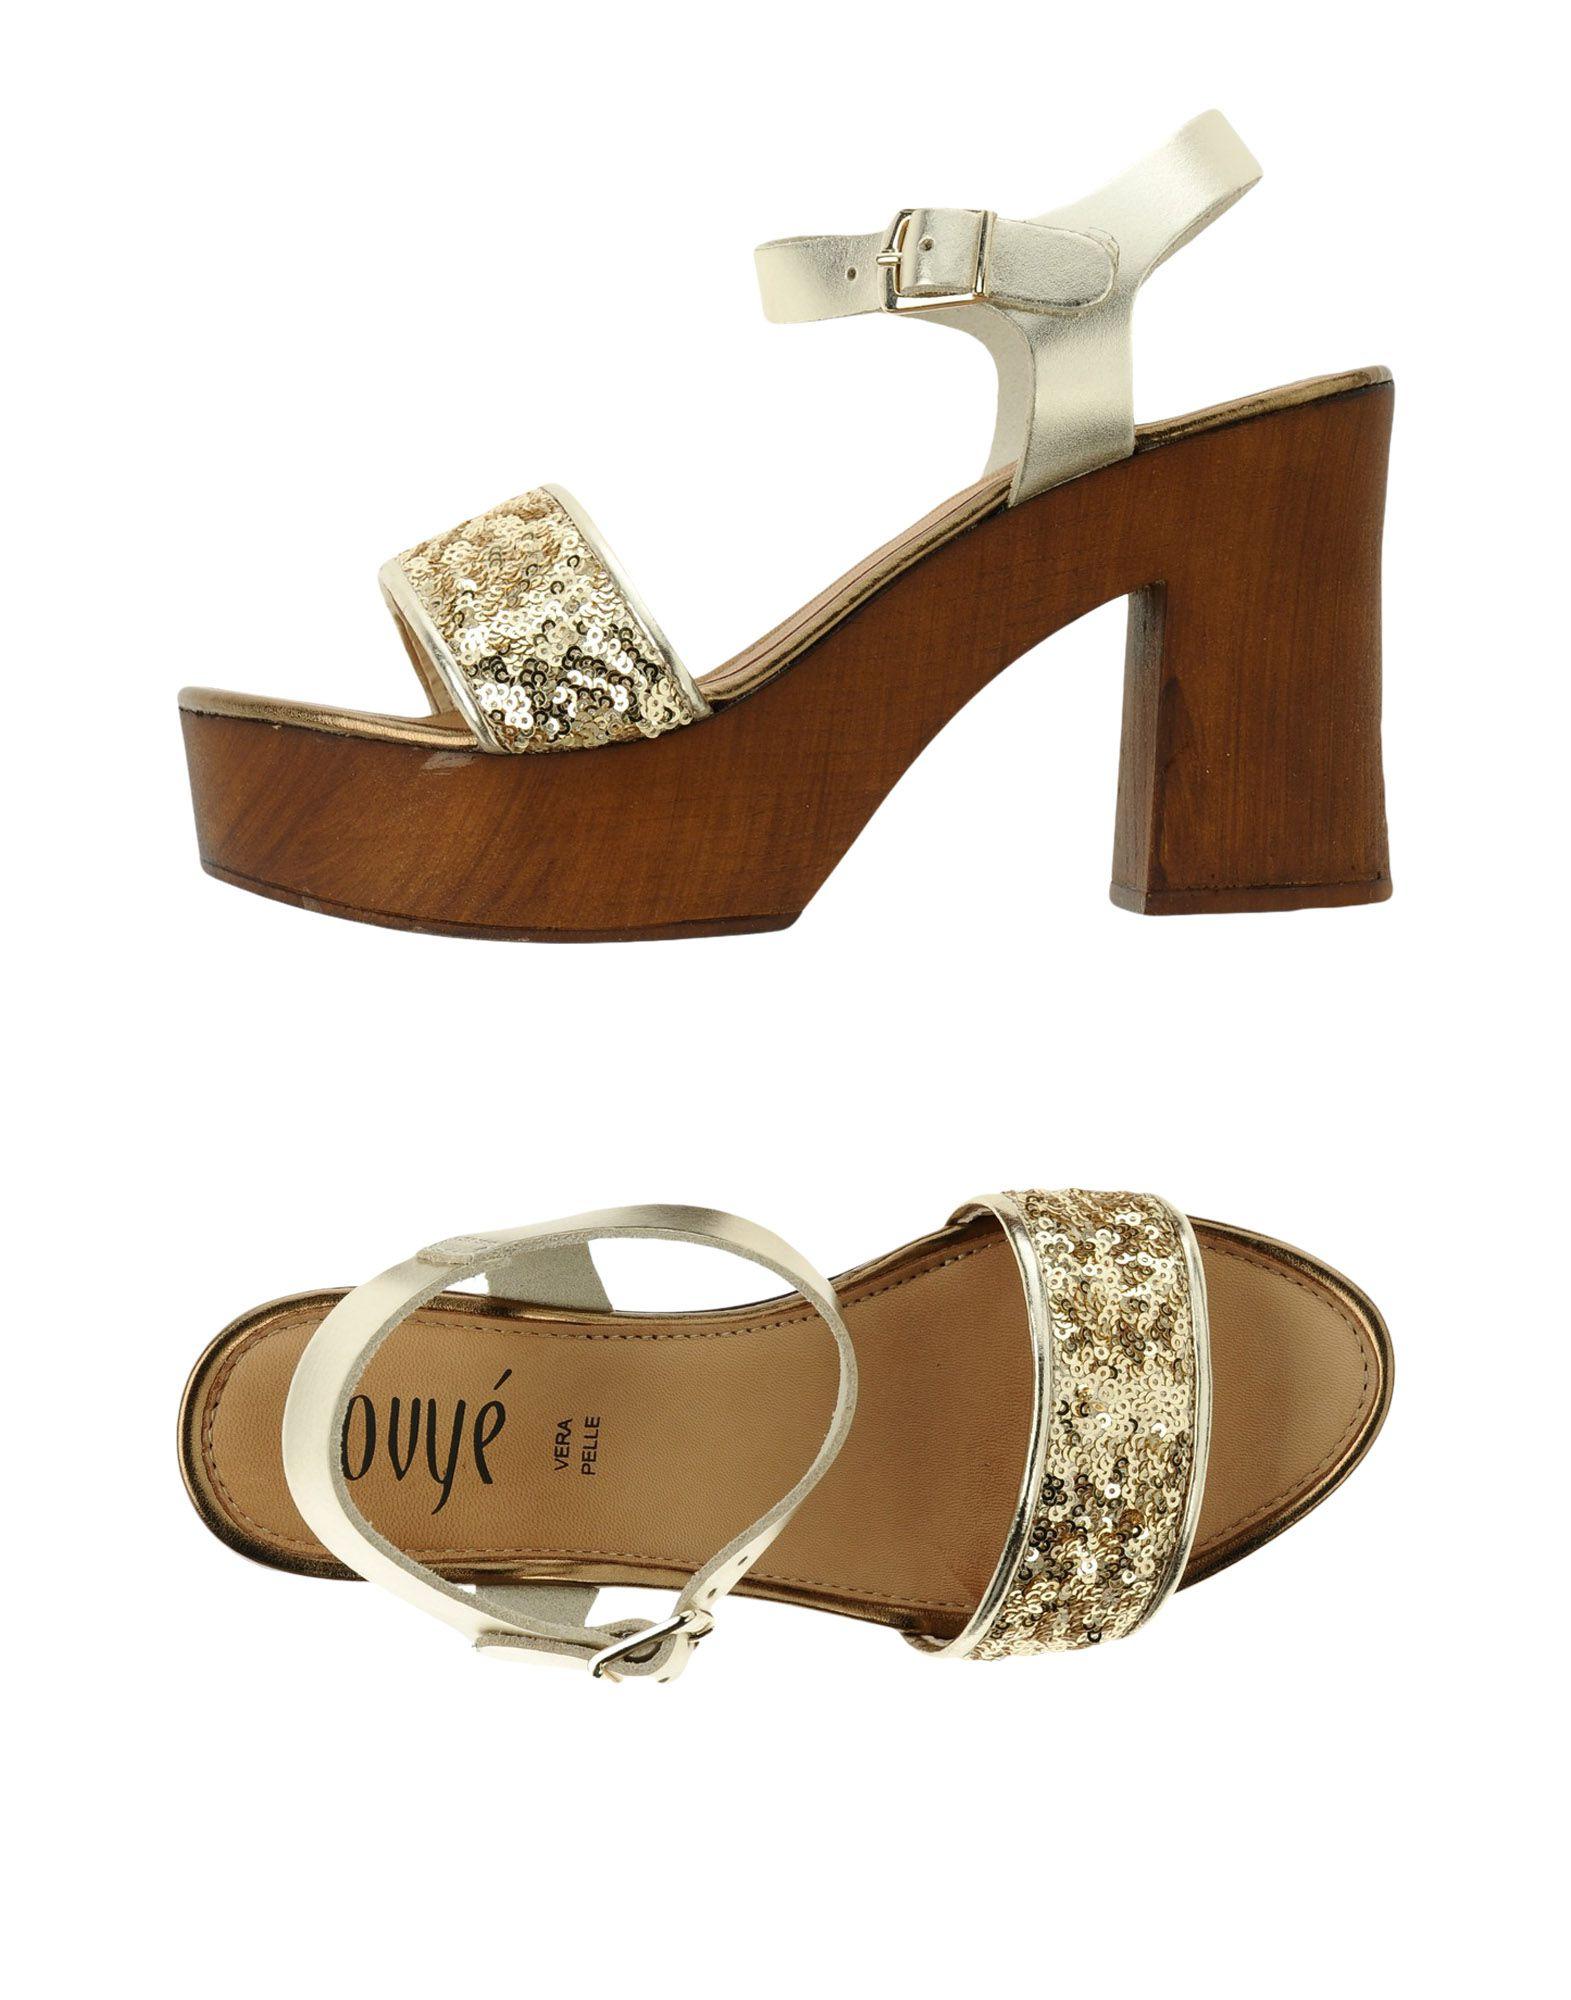 Chaussures - Mules Ovye Par Cristina Lucchi UJjjKwq3F